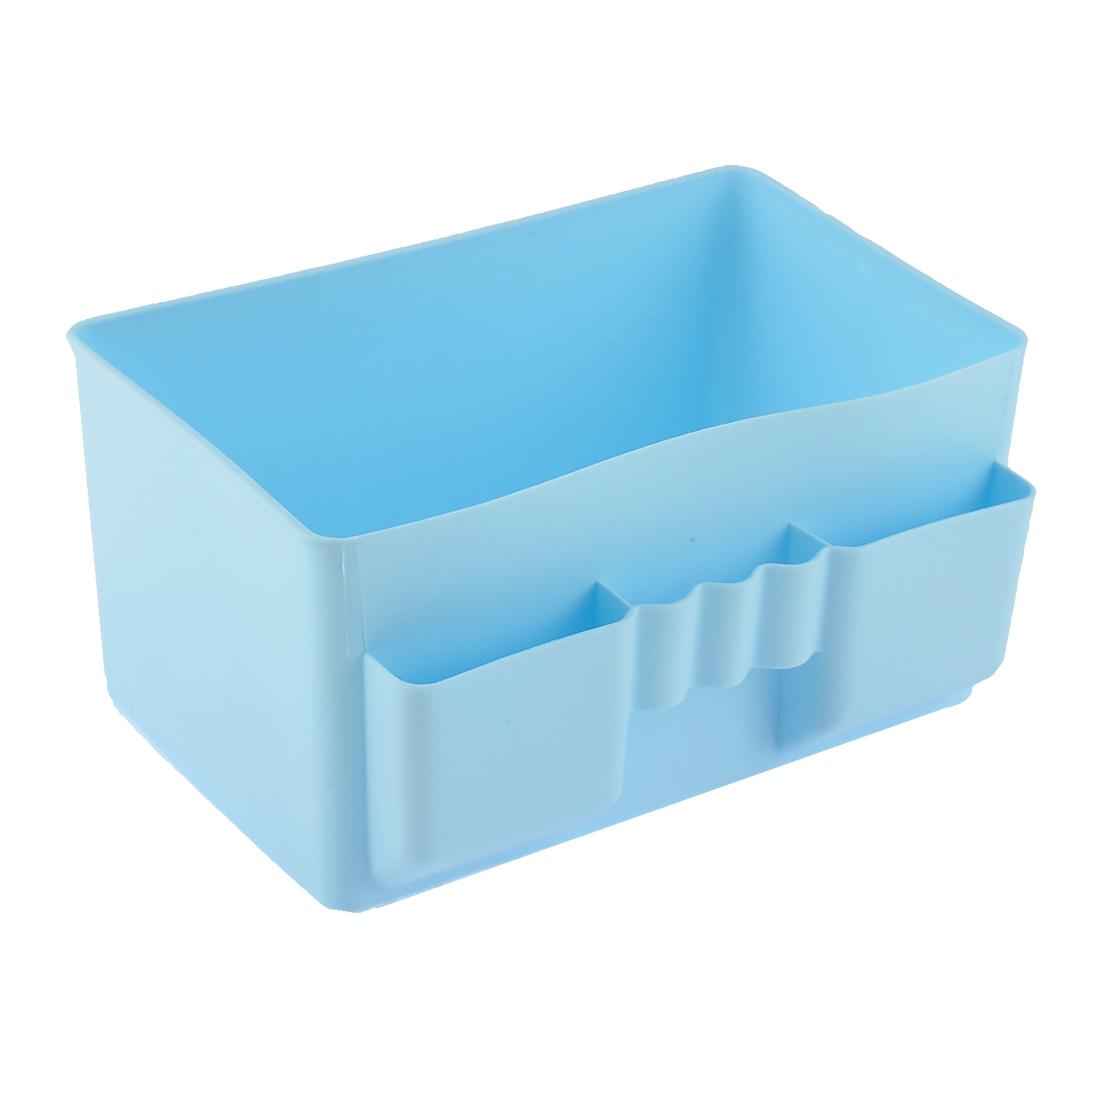 Office Toilet Makeup Desktop Plastic Storage Case Basket Divider Box Blue